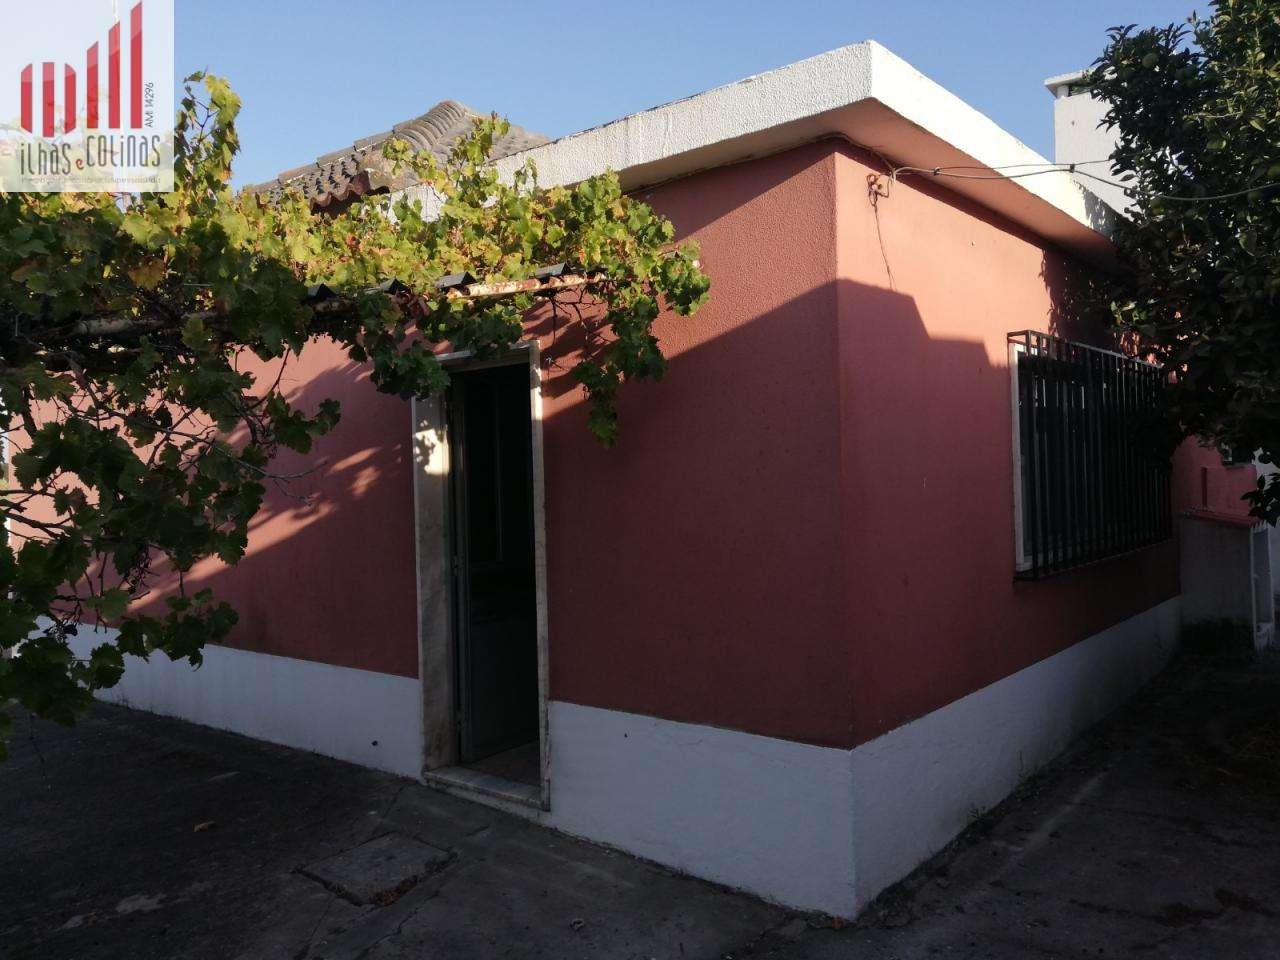 Moradia para comprar, Sarilhos Grandes, Montijo, Setúbal - Foto 2